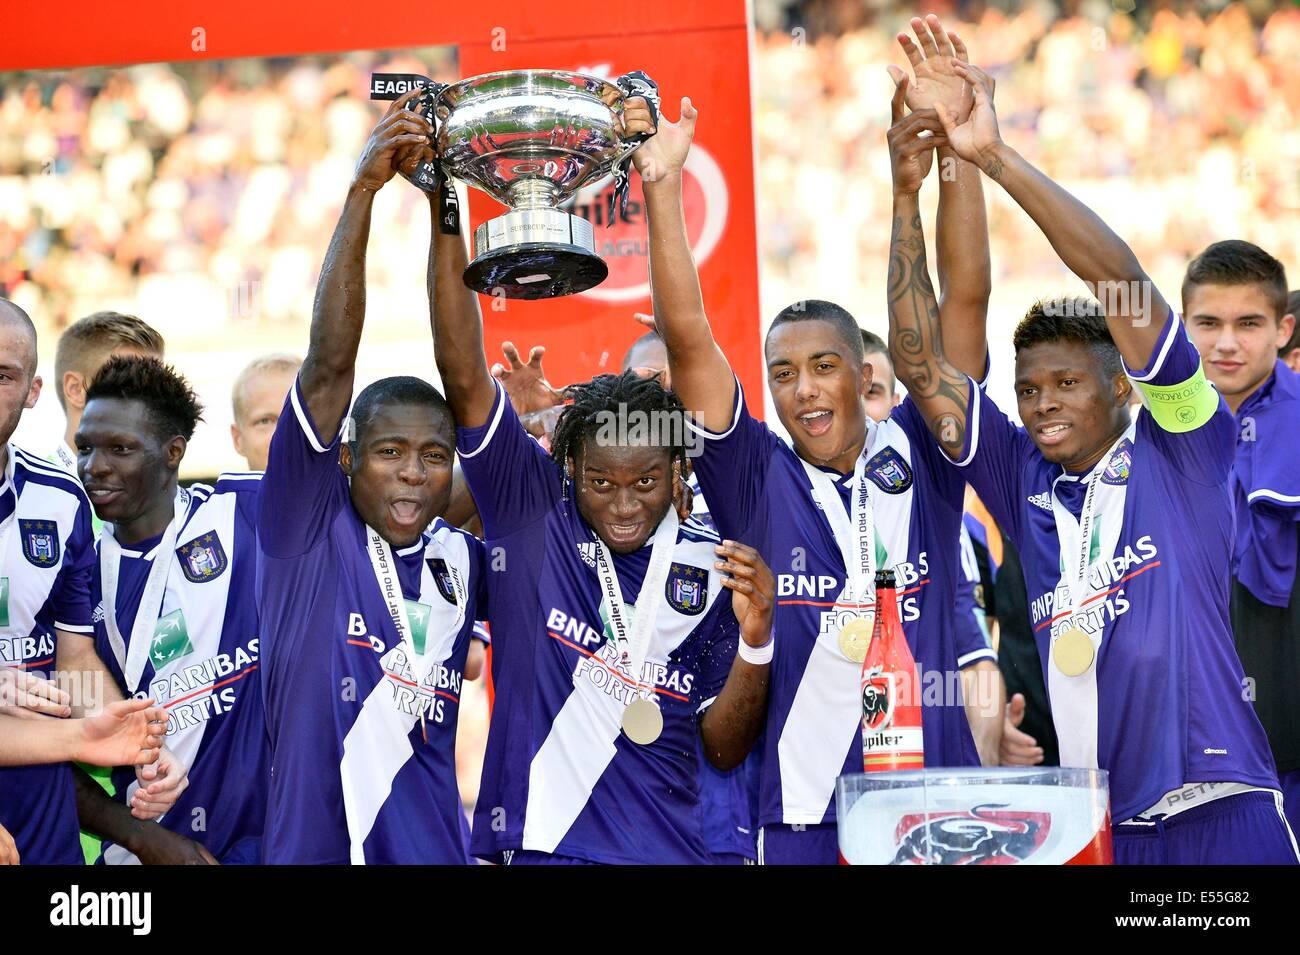 Brussels, Belgium. 20th July, 2014. Super Cup final of the Belgian Juliper League, between Anderlecht and Lokeren. - Stock Image